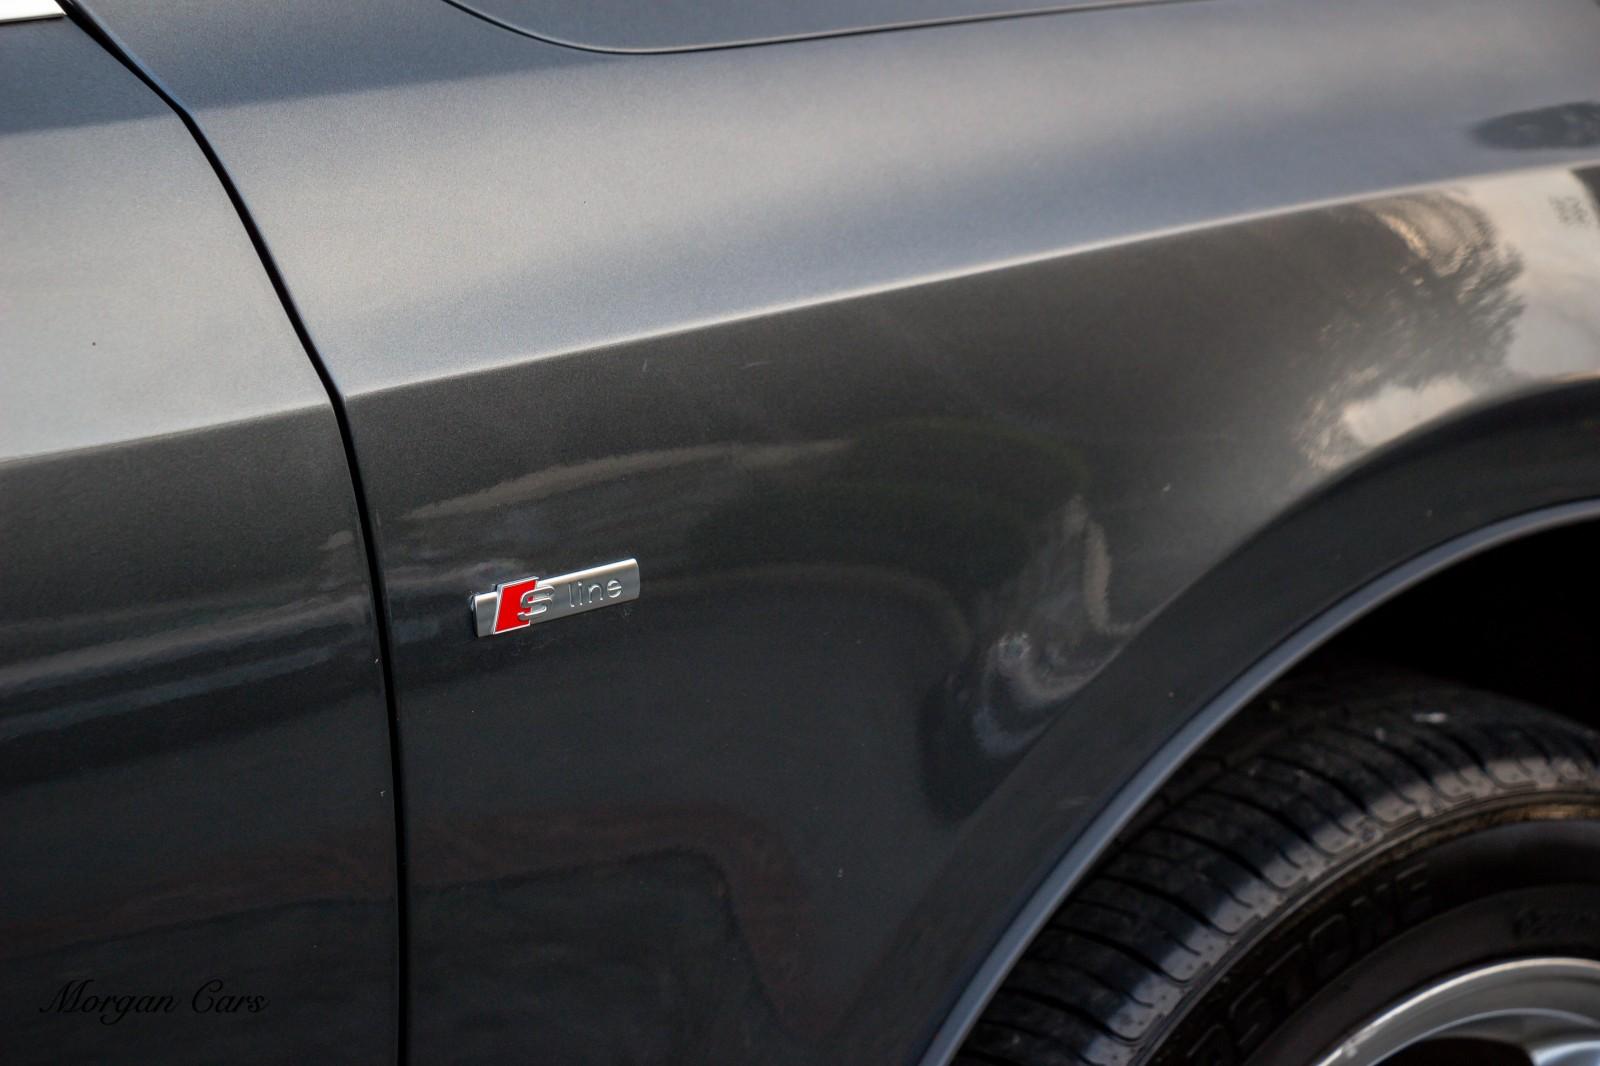 2016 Audi Q5 2.0 TDI QUATTRO S LINE PLUS Diesel Automatic – Morgan Cars 9 Mound Road, Warrenpoint, Newry BT34 3LW, UK full